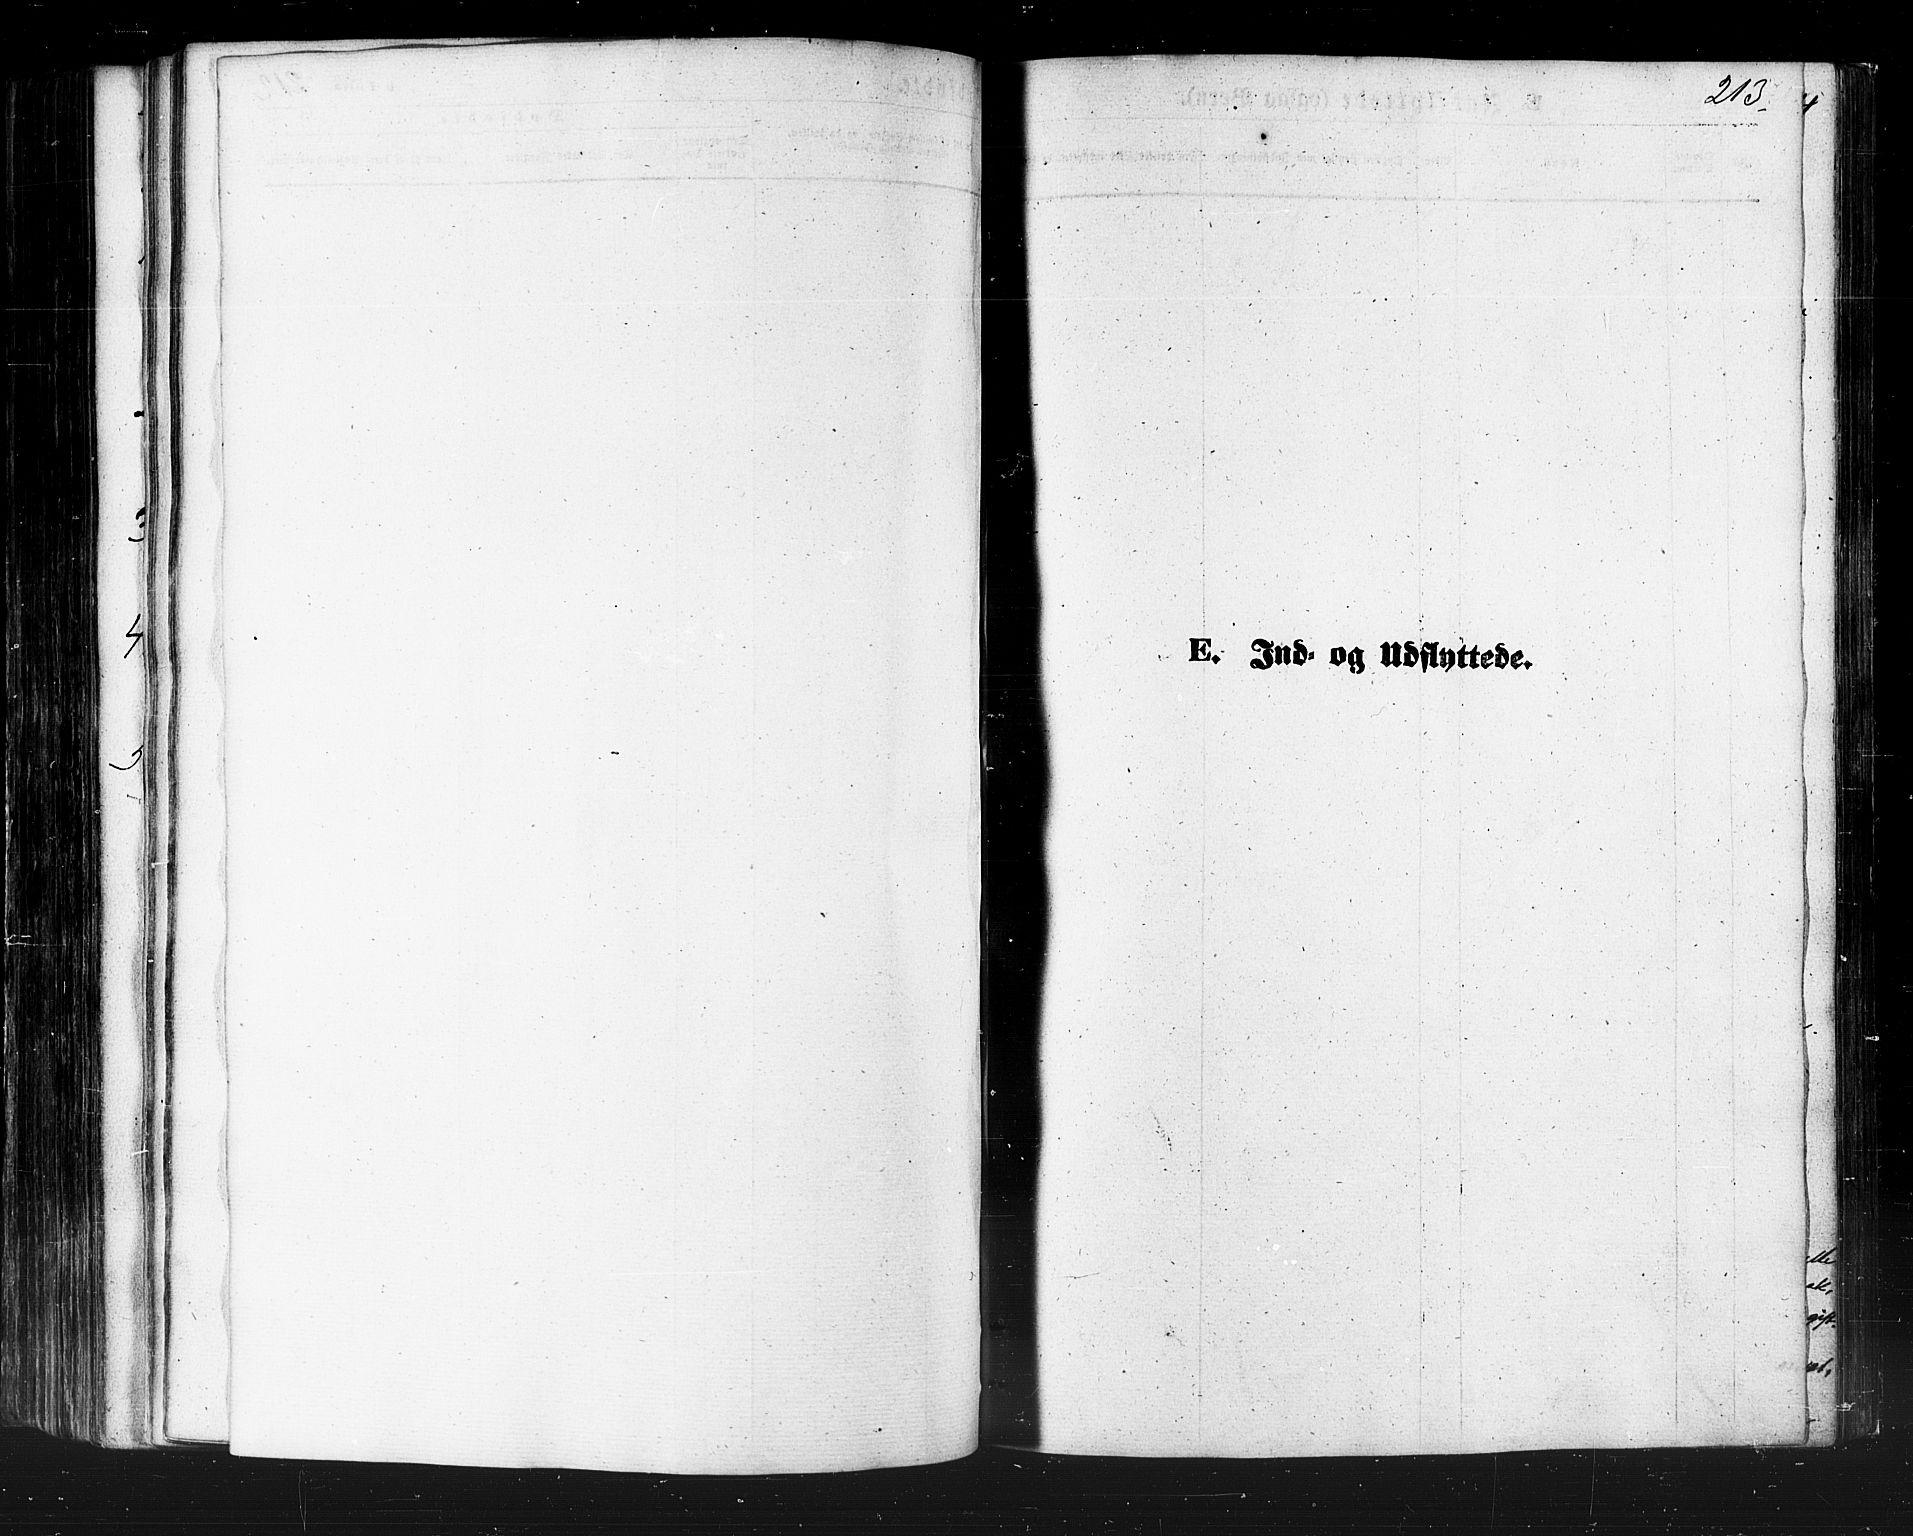 SATØ, Karasjok sokneprestkontor, H/Ha/L0001kirke: Ministerialbok nr. 1, 1872-1884, s. 213